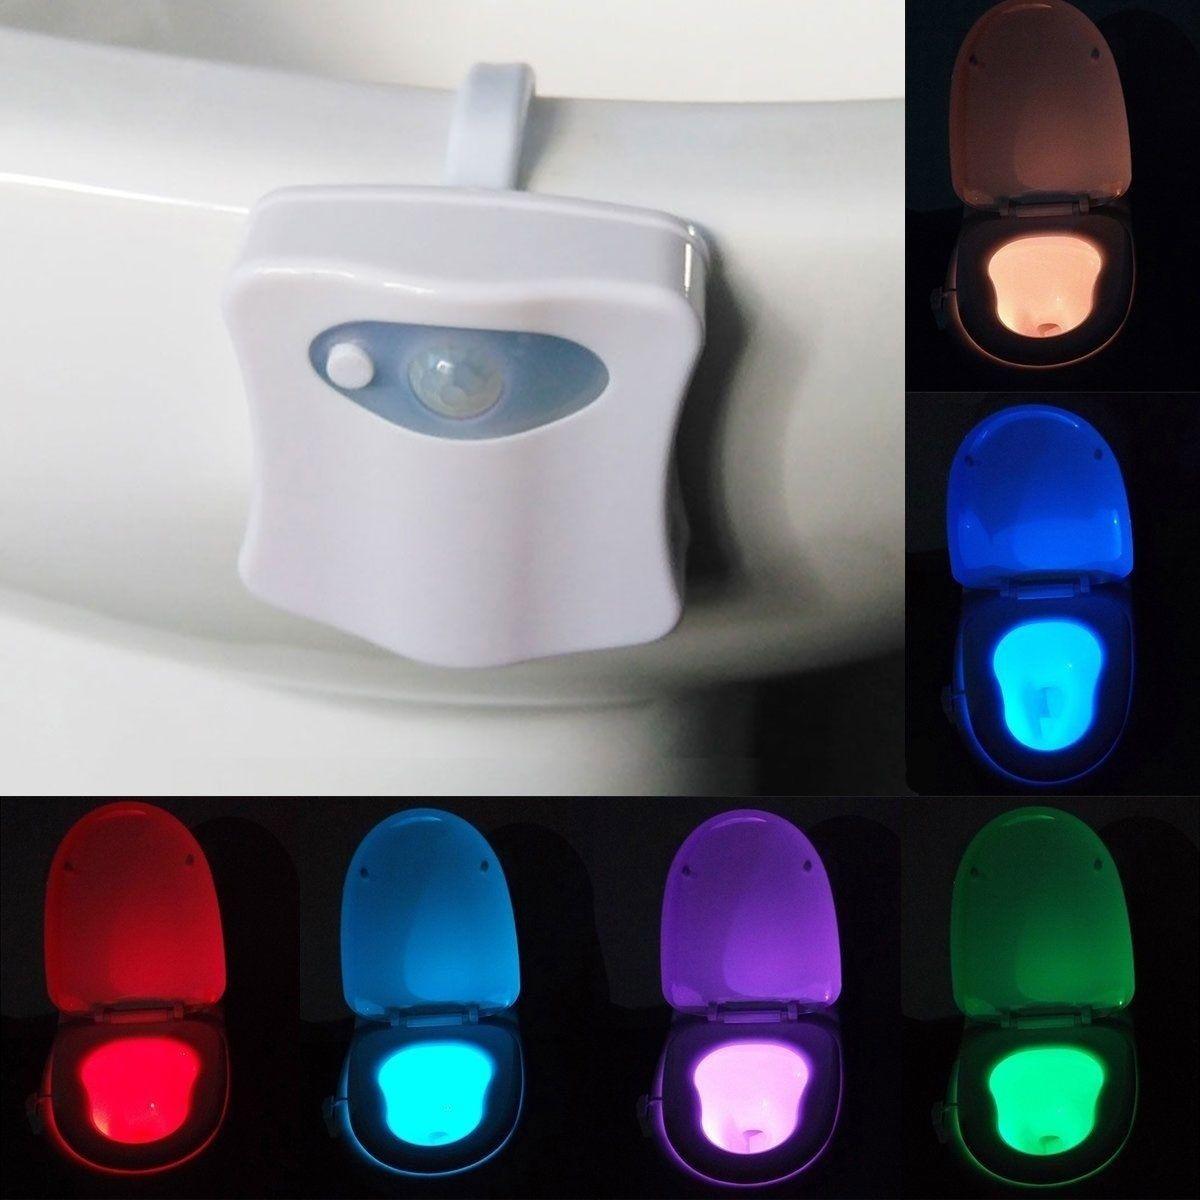 closestool light hot sale human motion sensor automatic seat led light toilet bowl bathroom 8color lamp free shipping